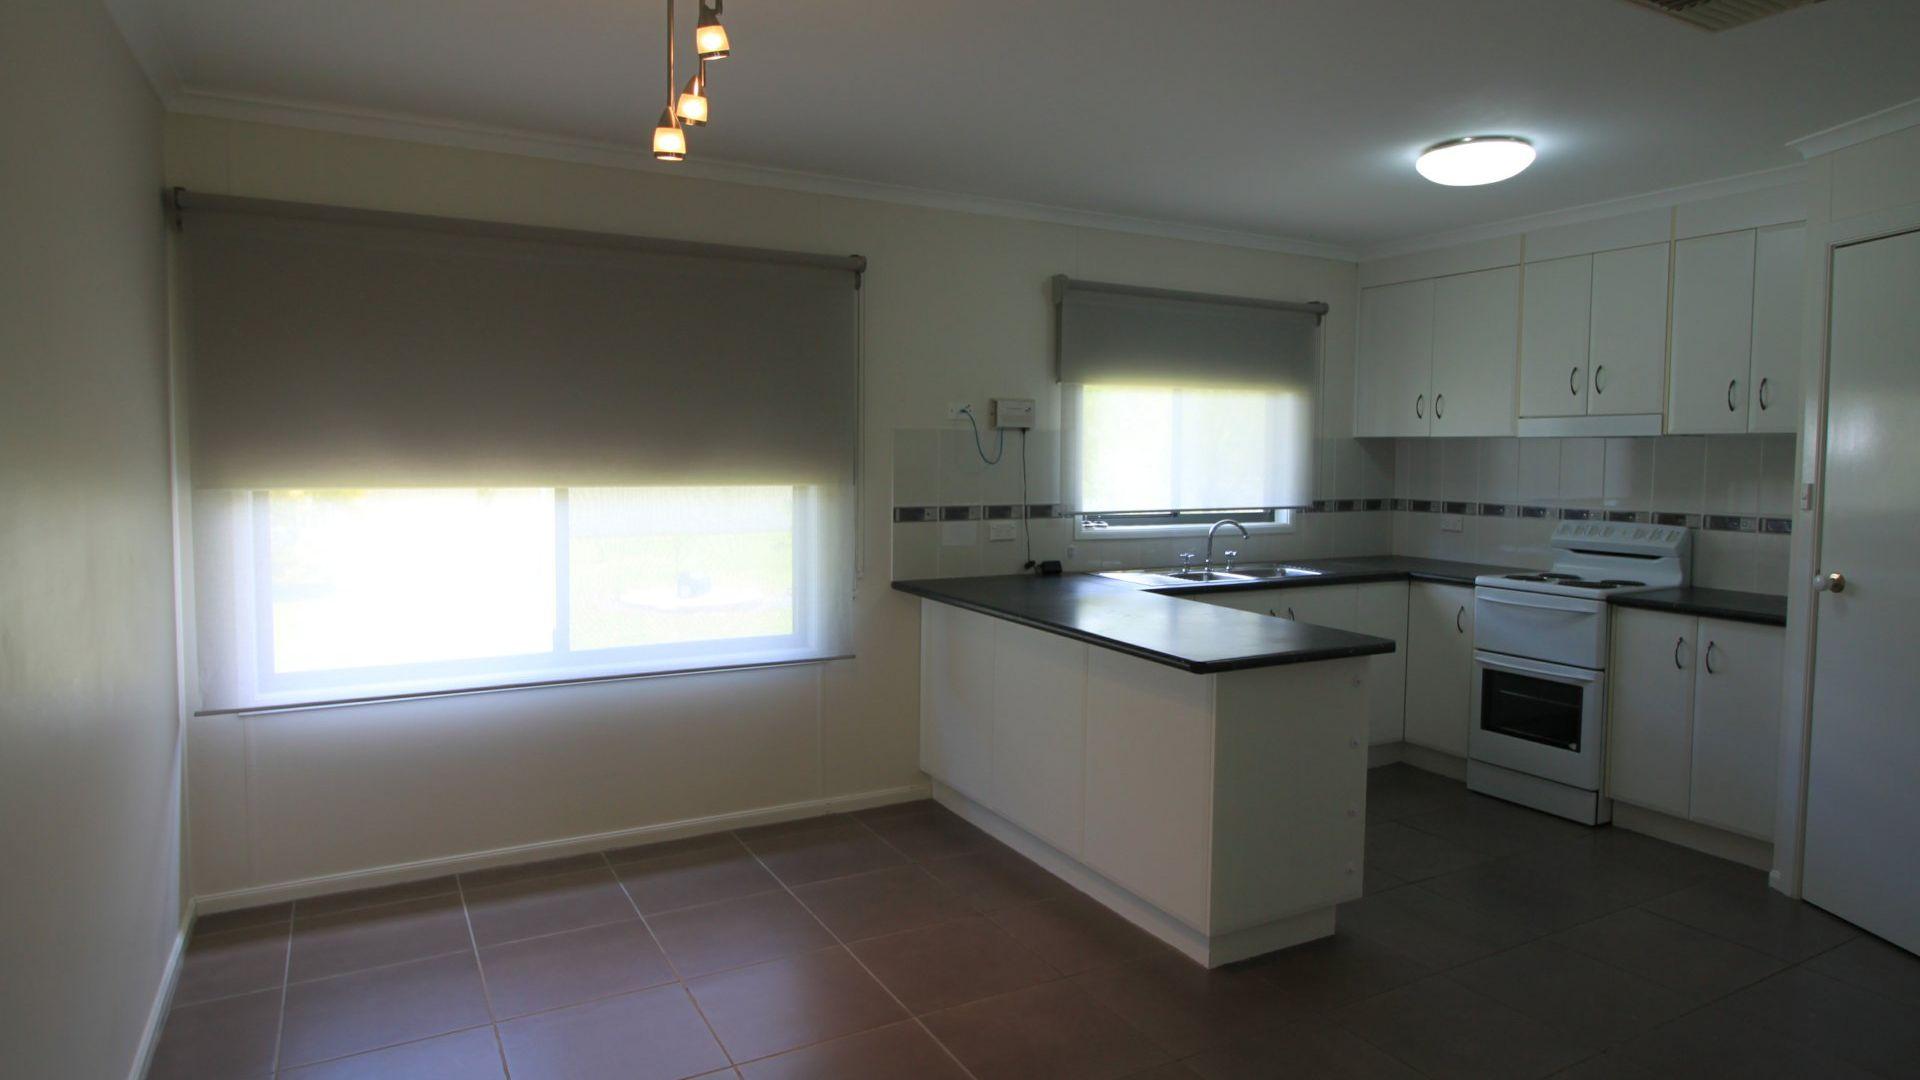 33-35 Fredrick Street, Woolomin NSW 2340, Image 2